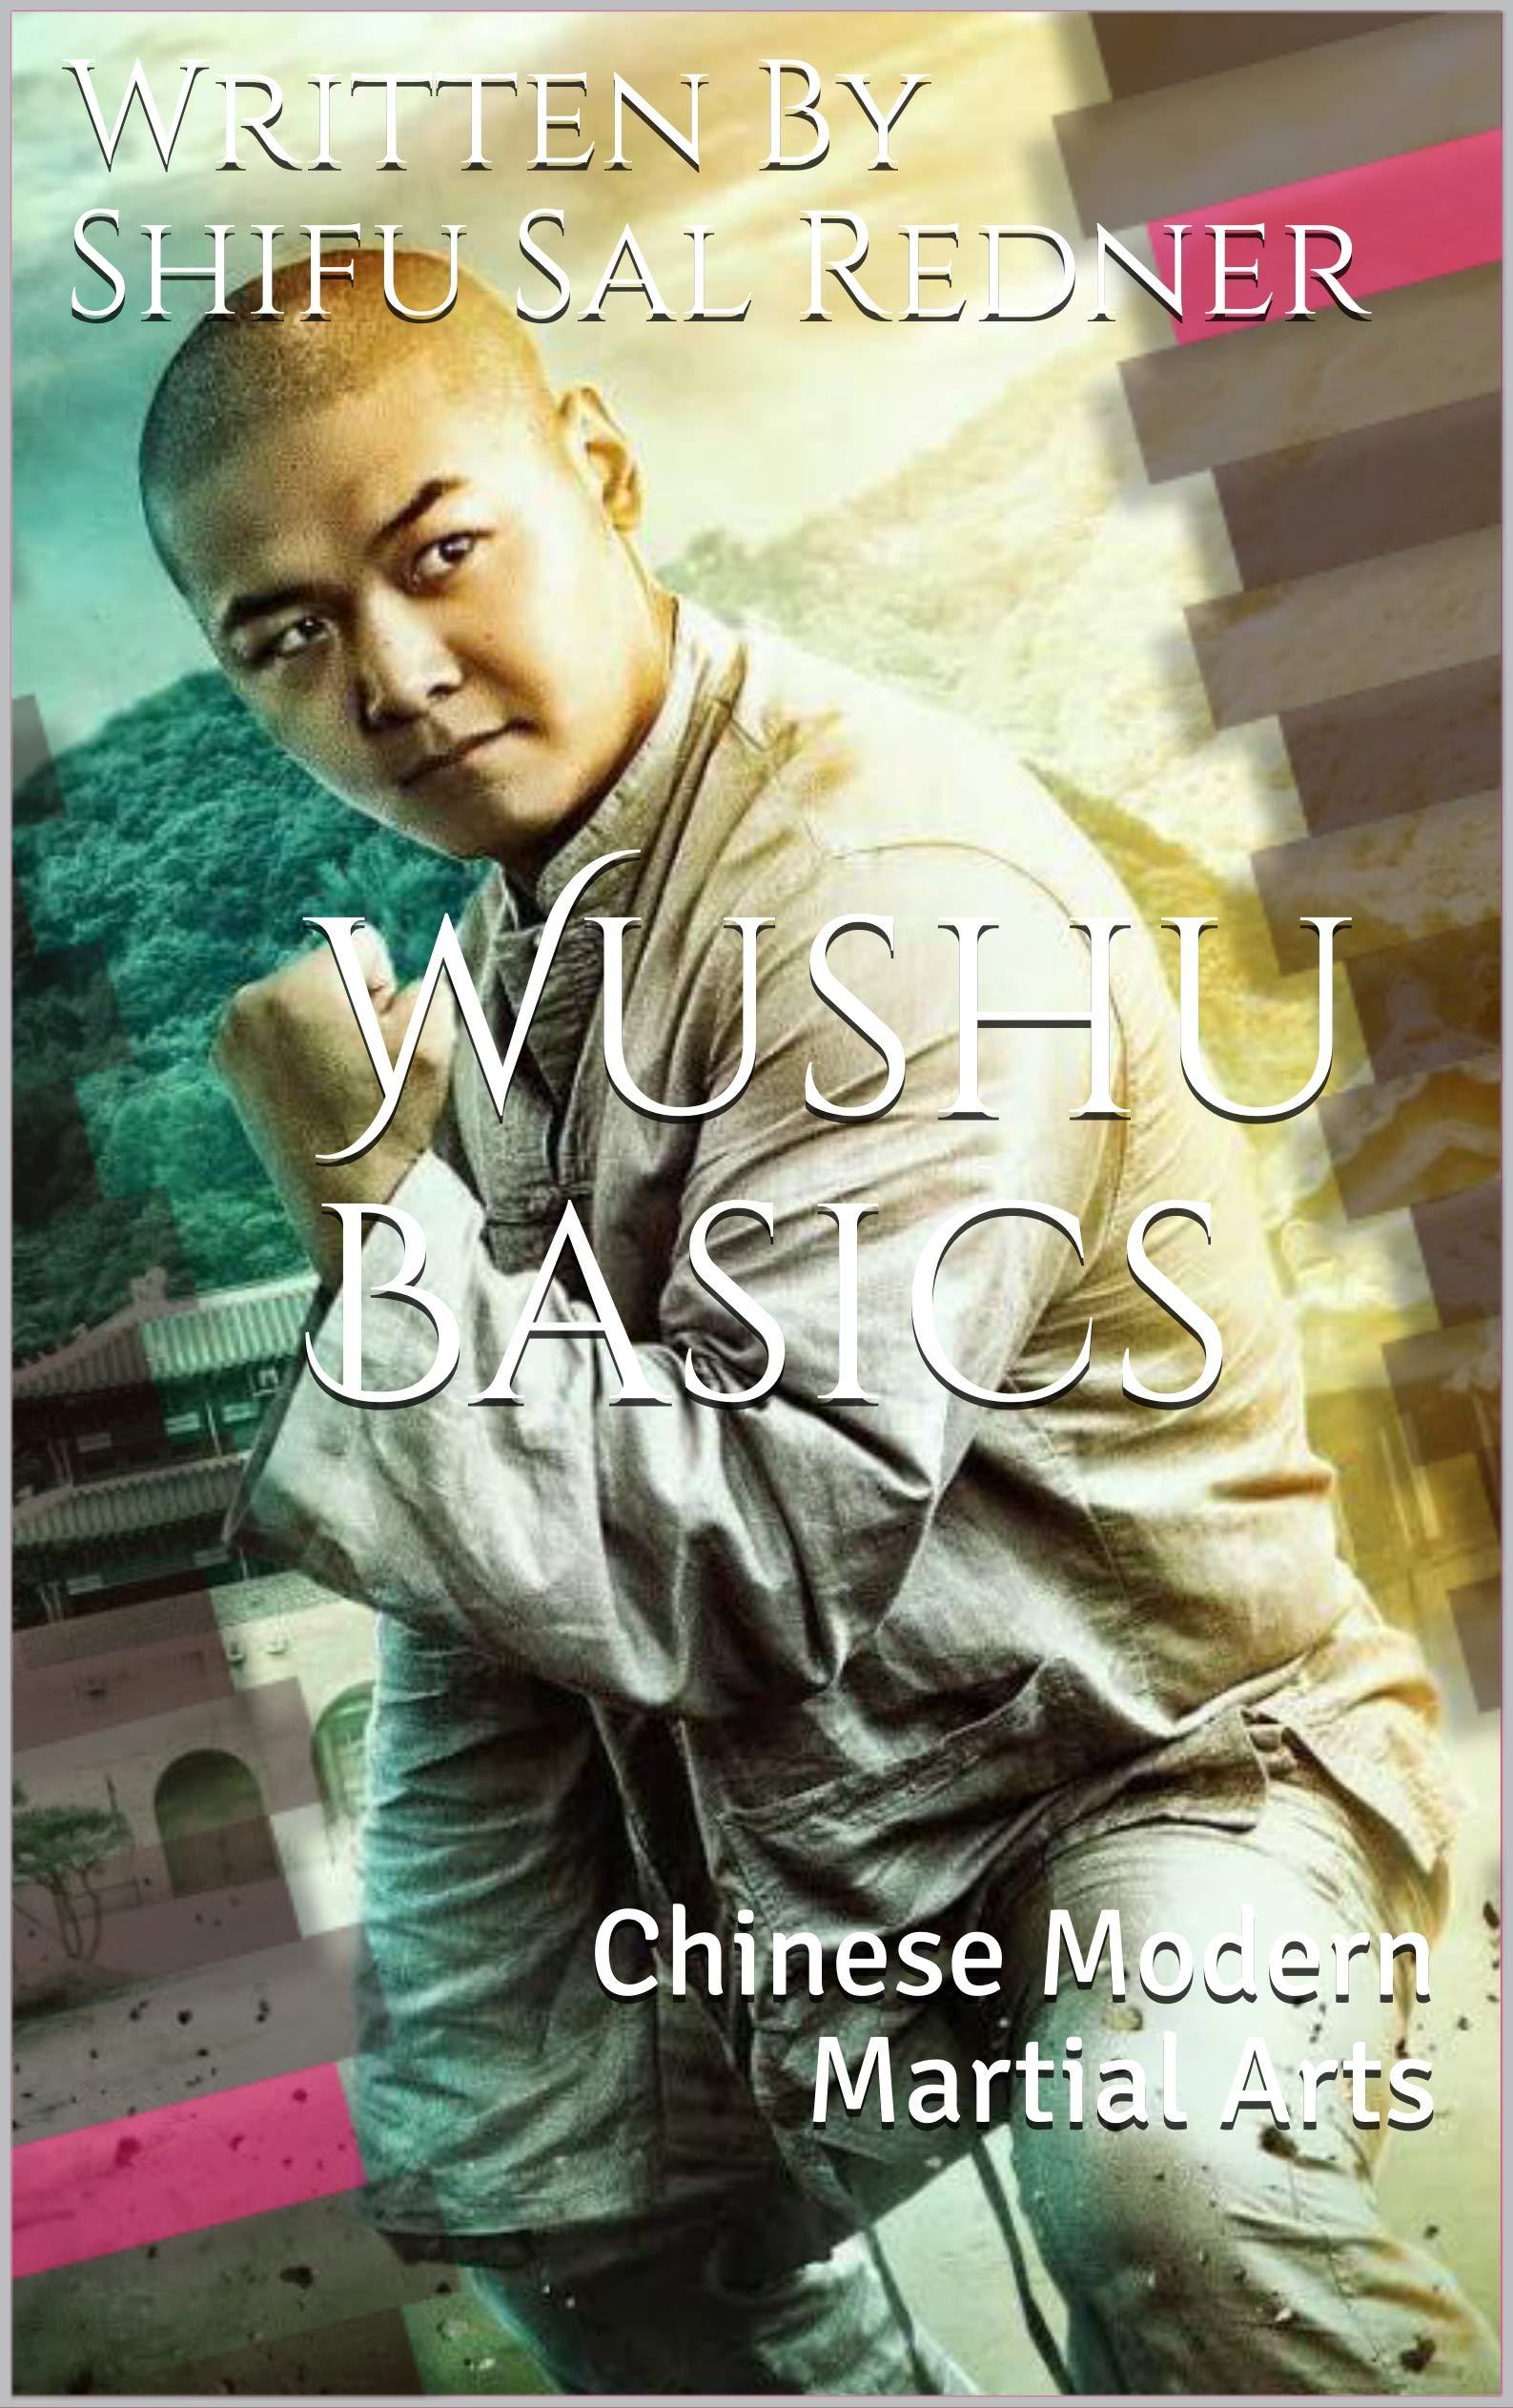 Wushu Basics : Chinese Modern Martial Arts (Wushu Shaolin Kung Fu  Book 1)